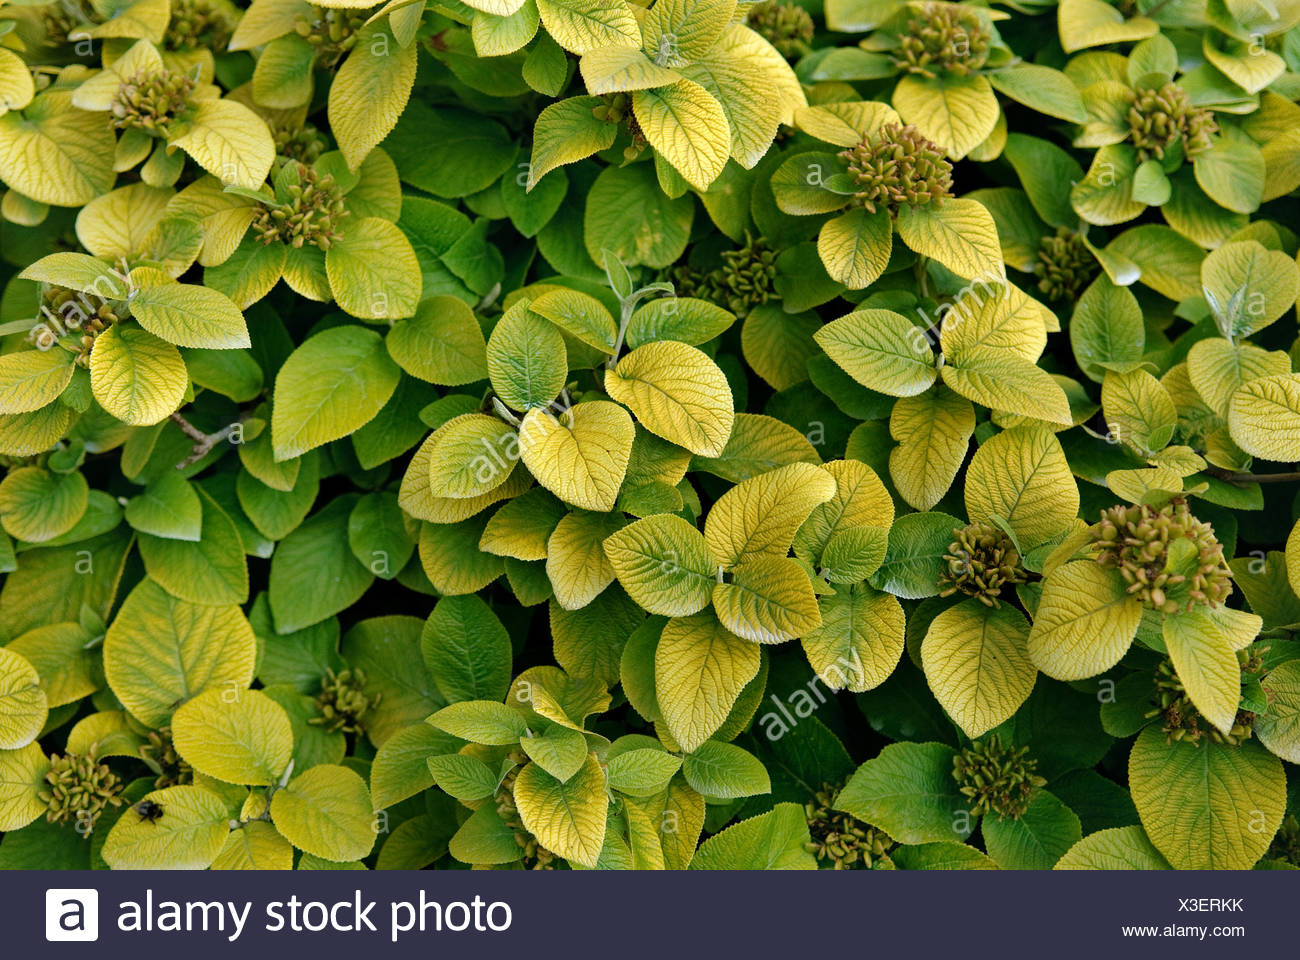 wayfaring-tree (Viburnum lantana 'Aureum', Viburnum lantana Aureum), cultvar Aureum - Stock Image